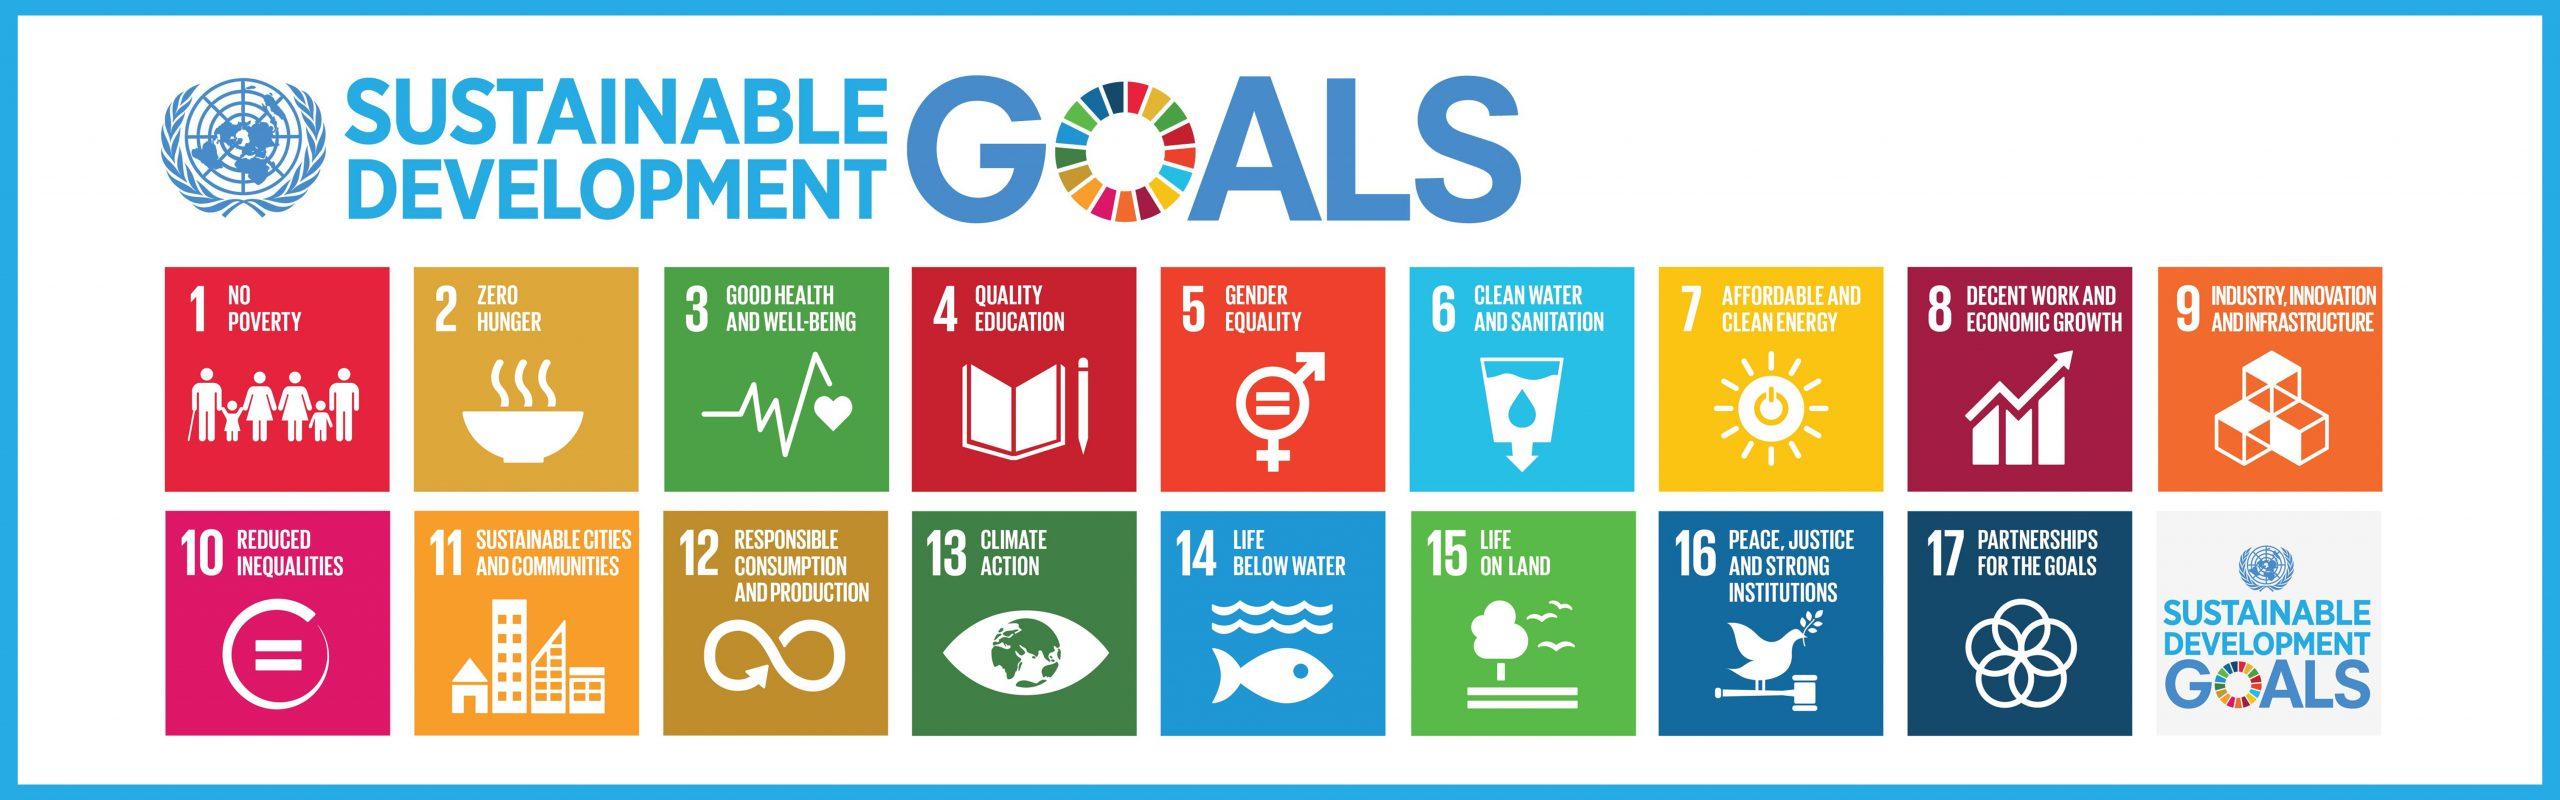 RUT for Sustainable Development Goals